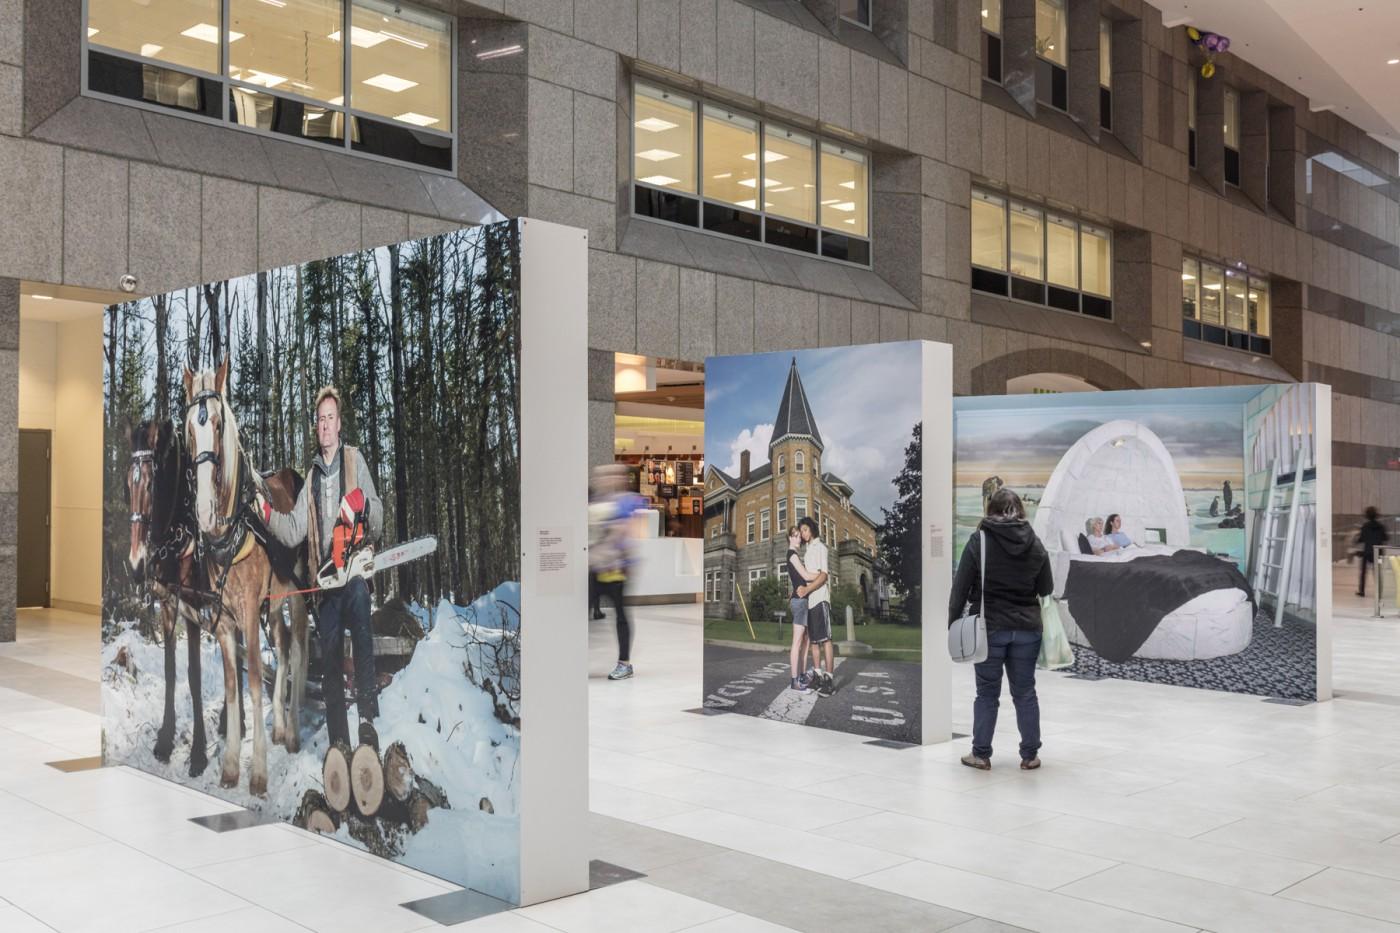 Naomi Harris, </span><span><em>OH CANADA!</em>, </span><span>Installation view at North York Centre, 2017. Photo by Toni Hafkenscheid.